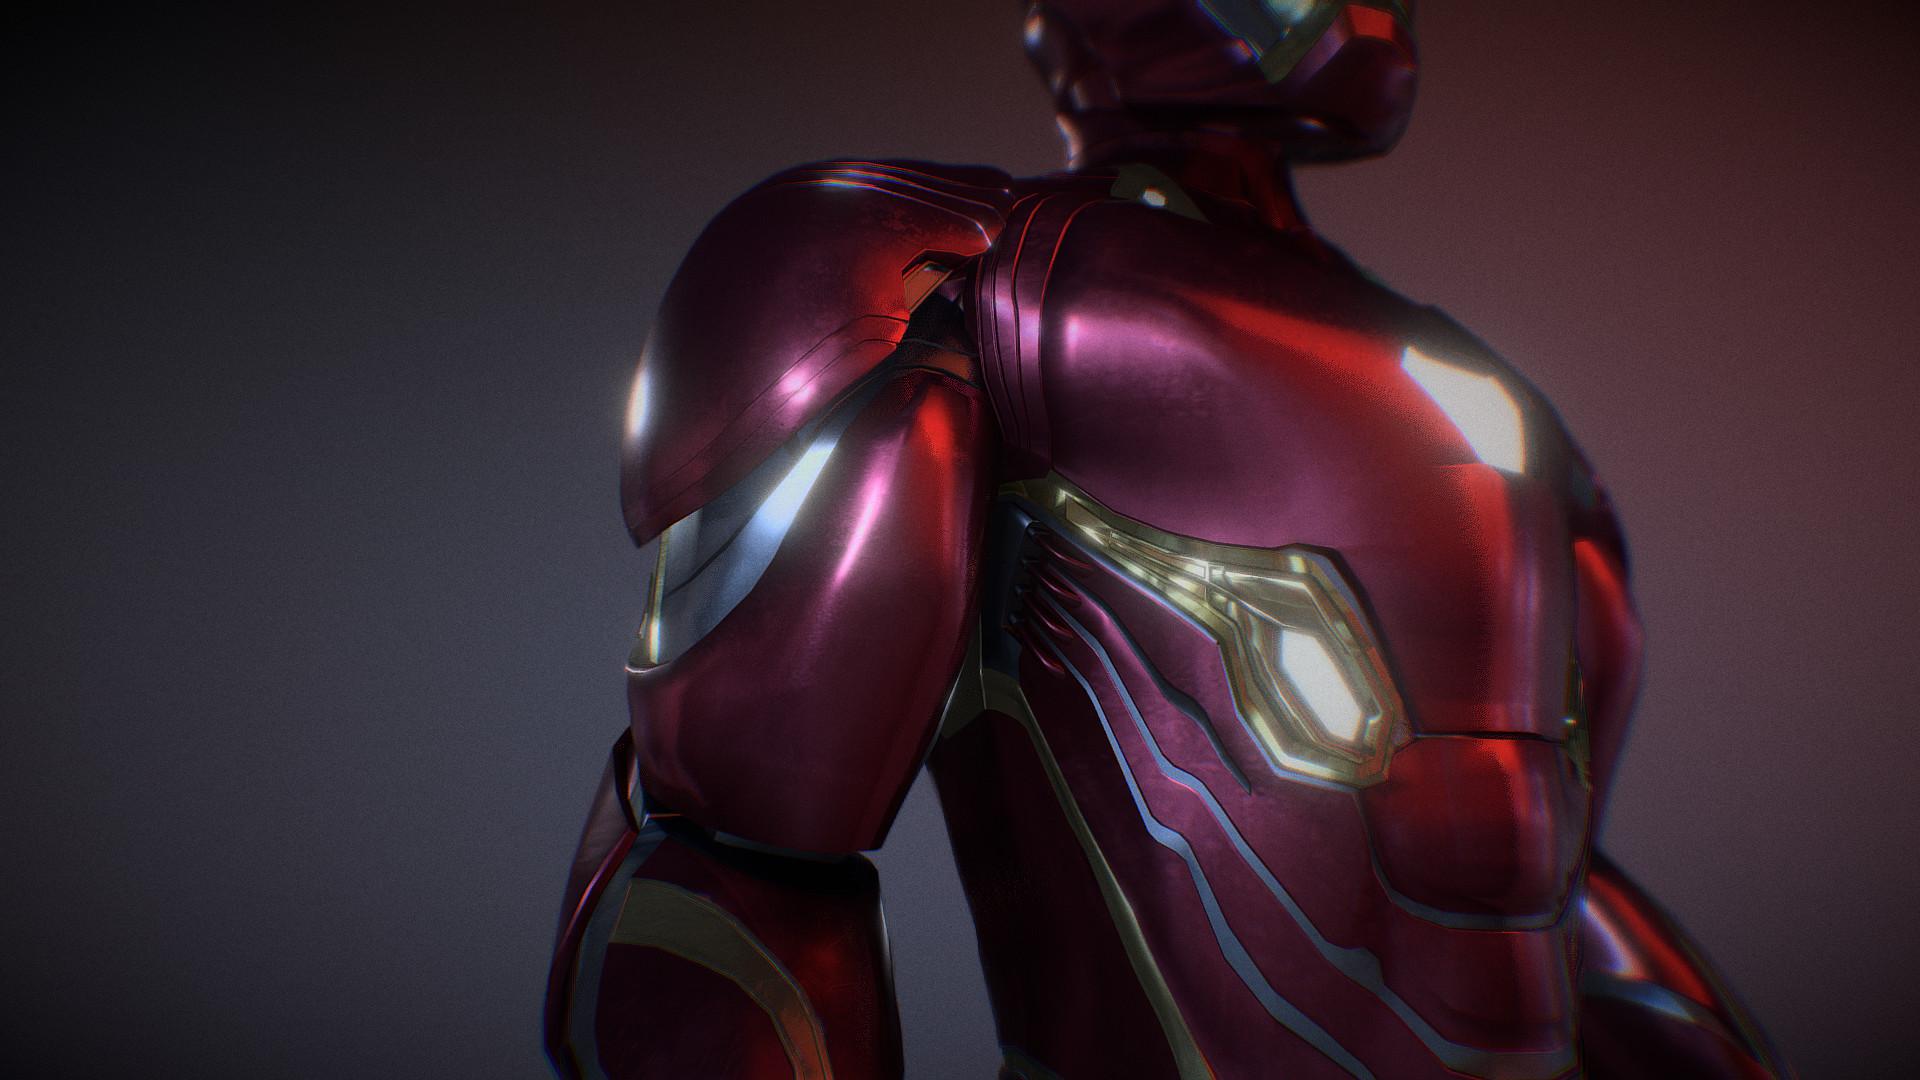 ArtStation - Iron Man - Avengers Infinity War Armor, James